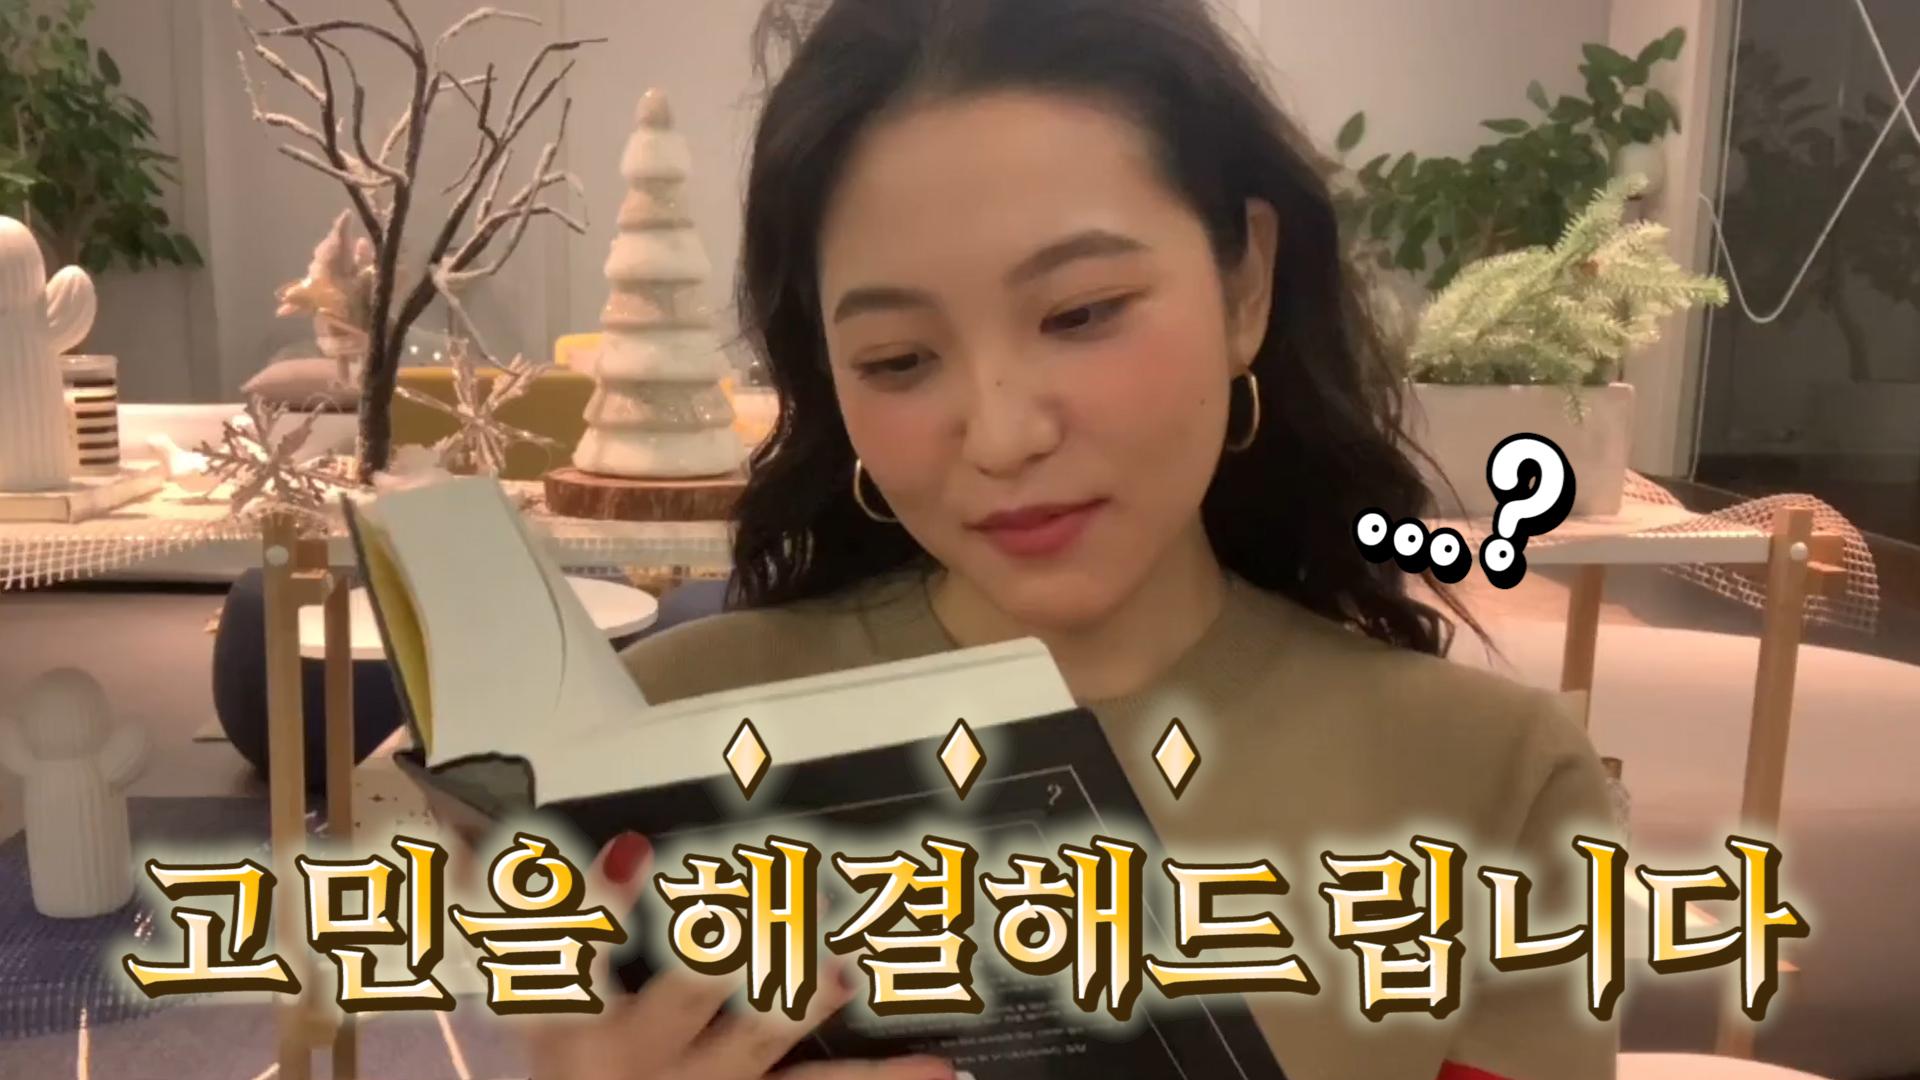 [Red Velvet] 제 고민은 울 옒 너무 사랑하는 거.. 해결할 생각은 없어요 (YERI's problem solving time with book)